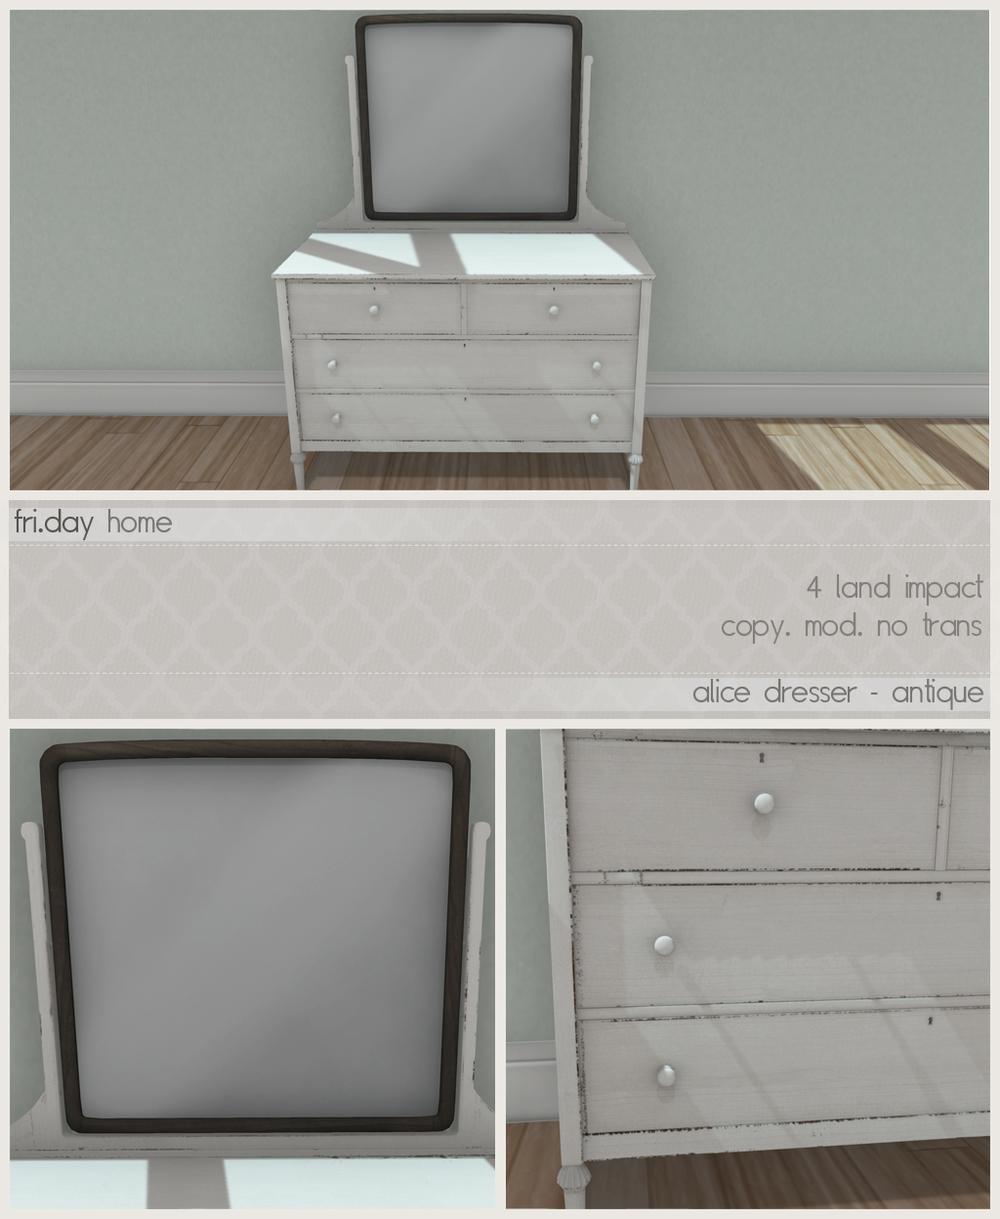 frihome - alice dresser ad (antique).jpg